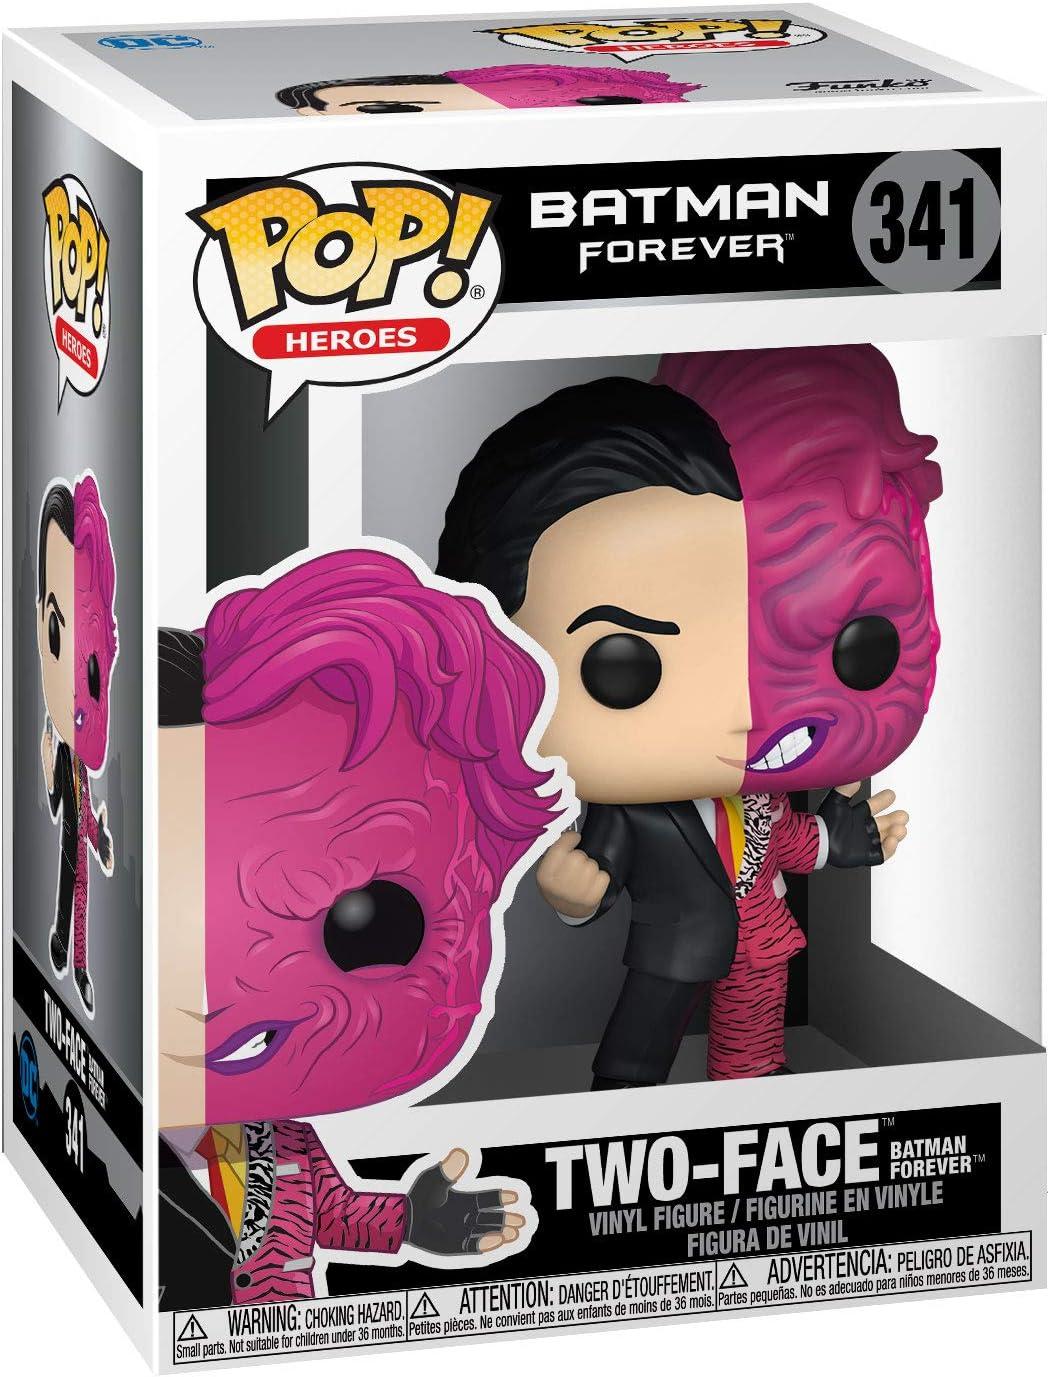 HEROES: BATMAN FOREVER 47705 RIDDLER POP